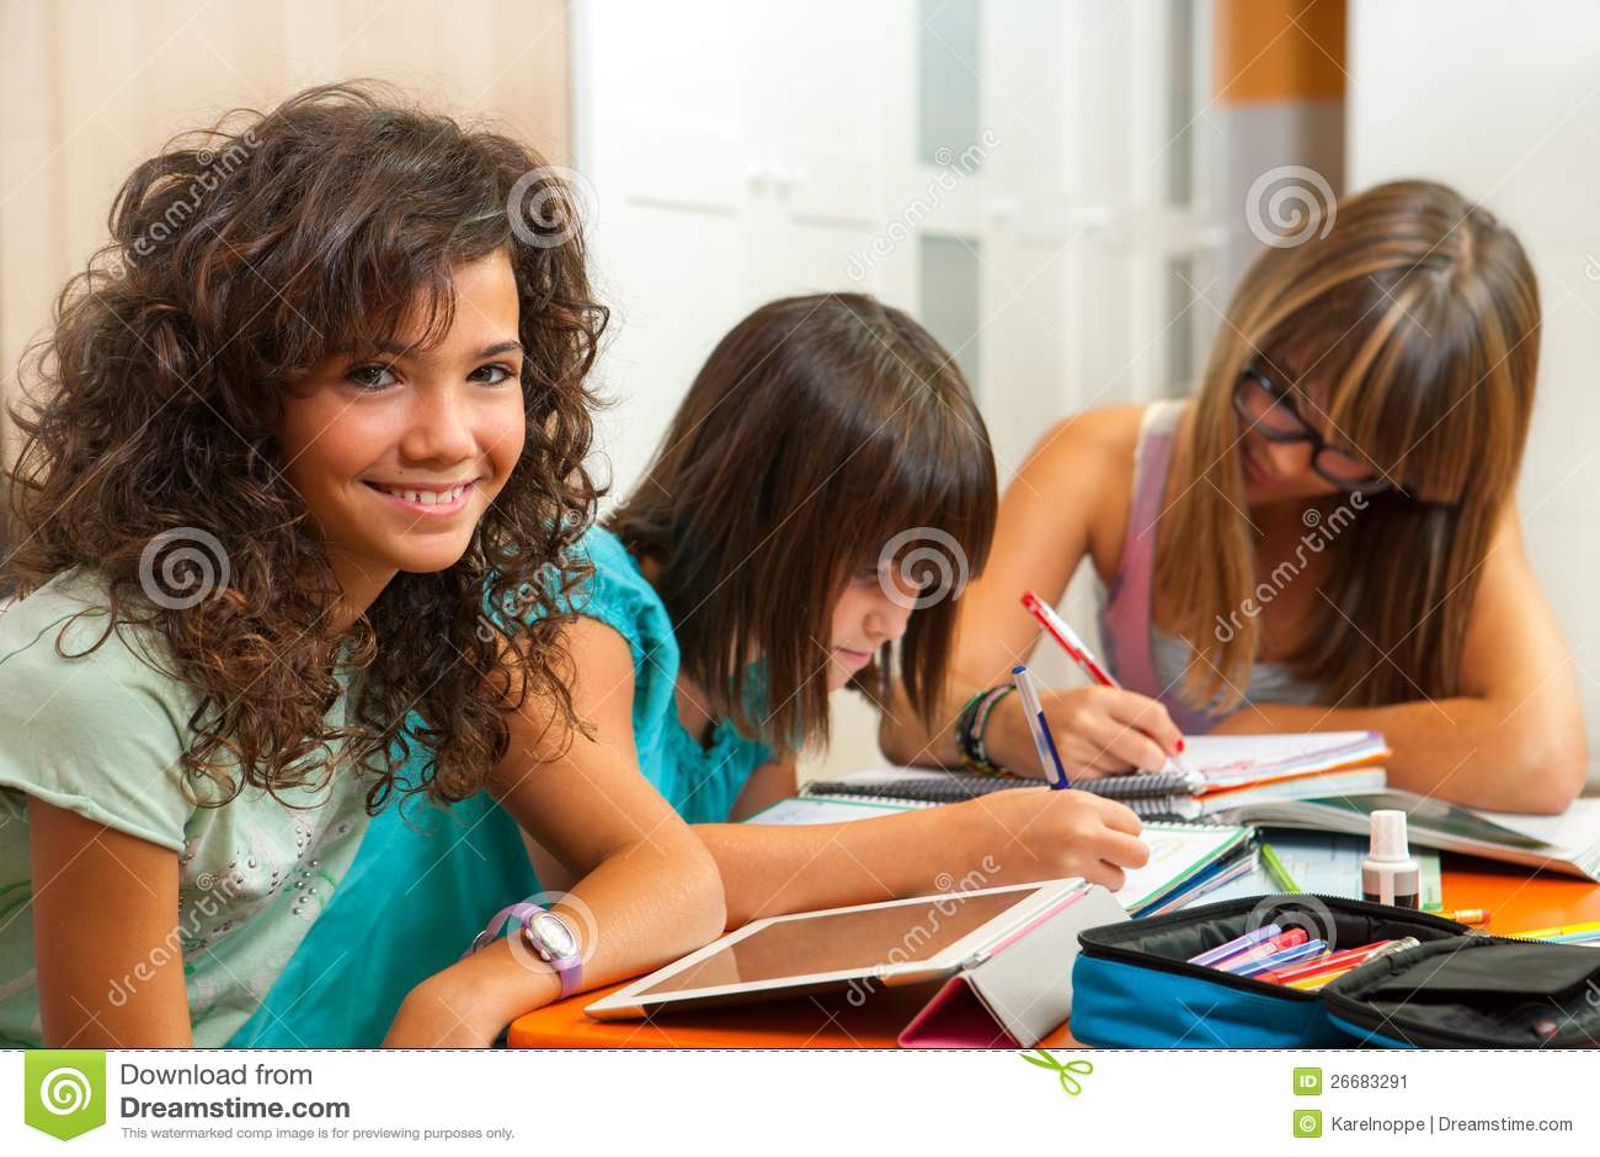 Teenage Girl With Friends Doing Homework Stock Image